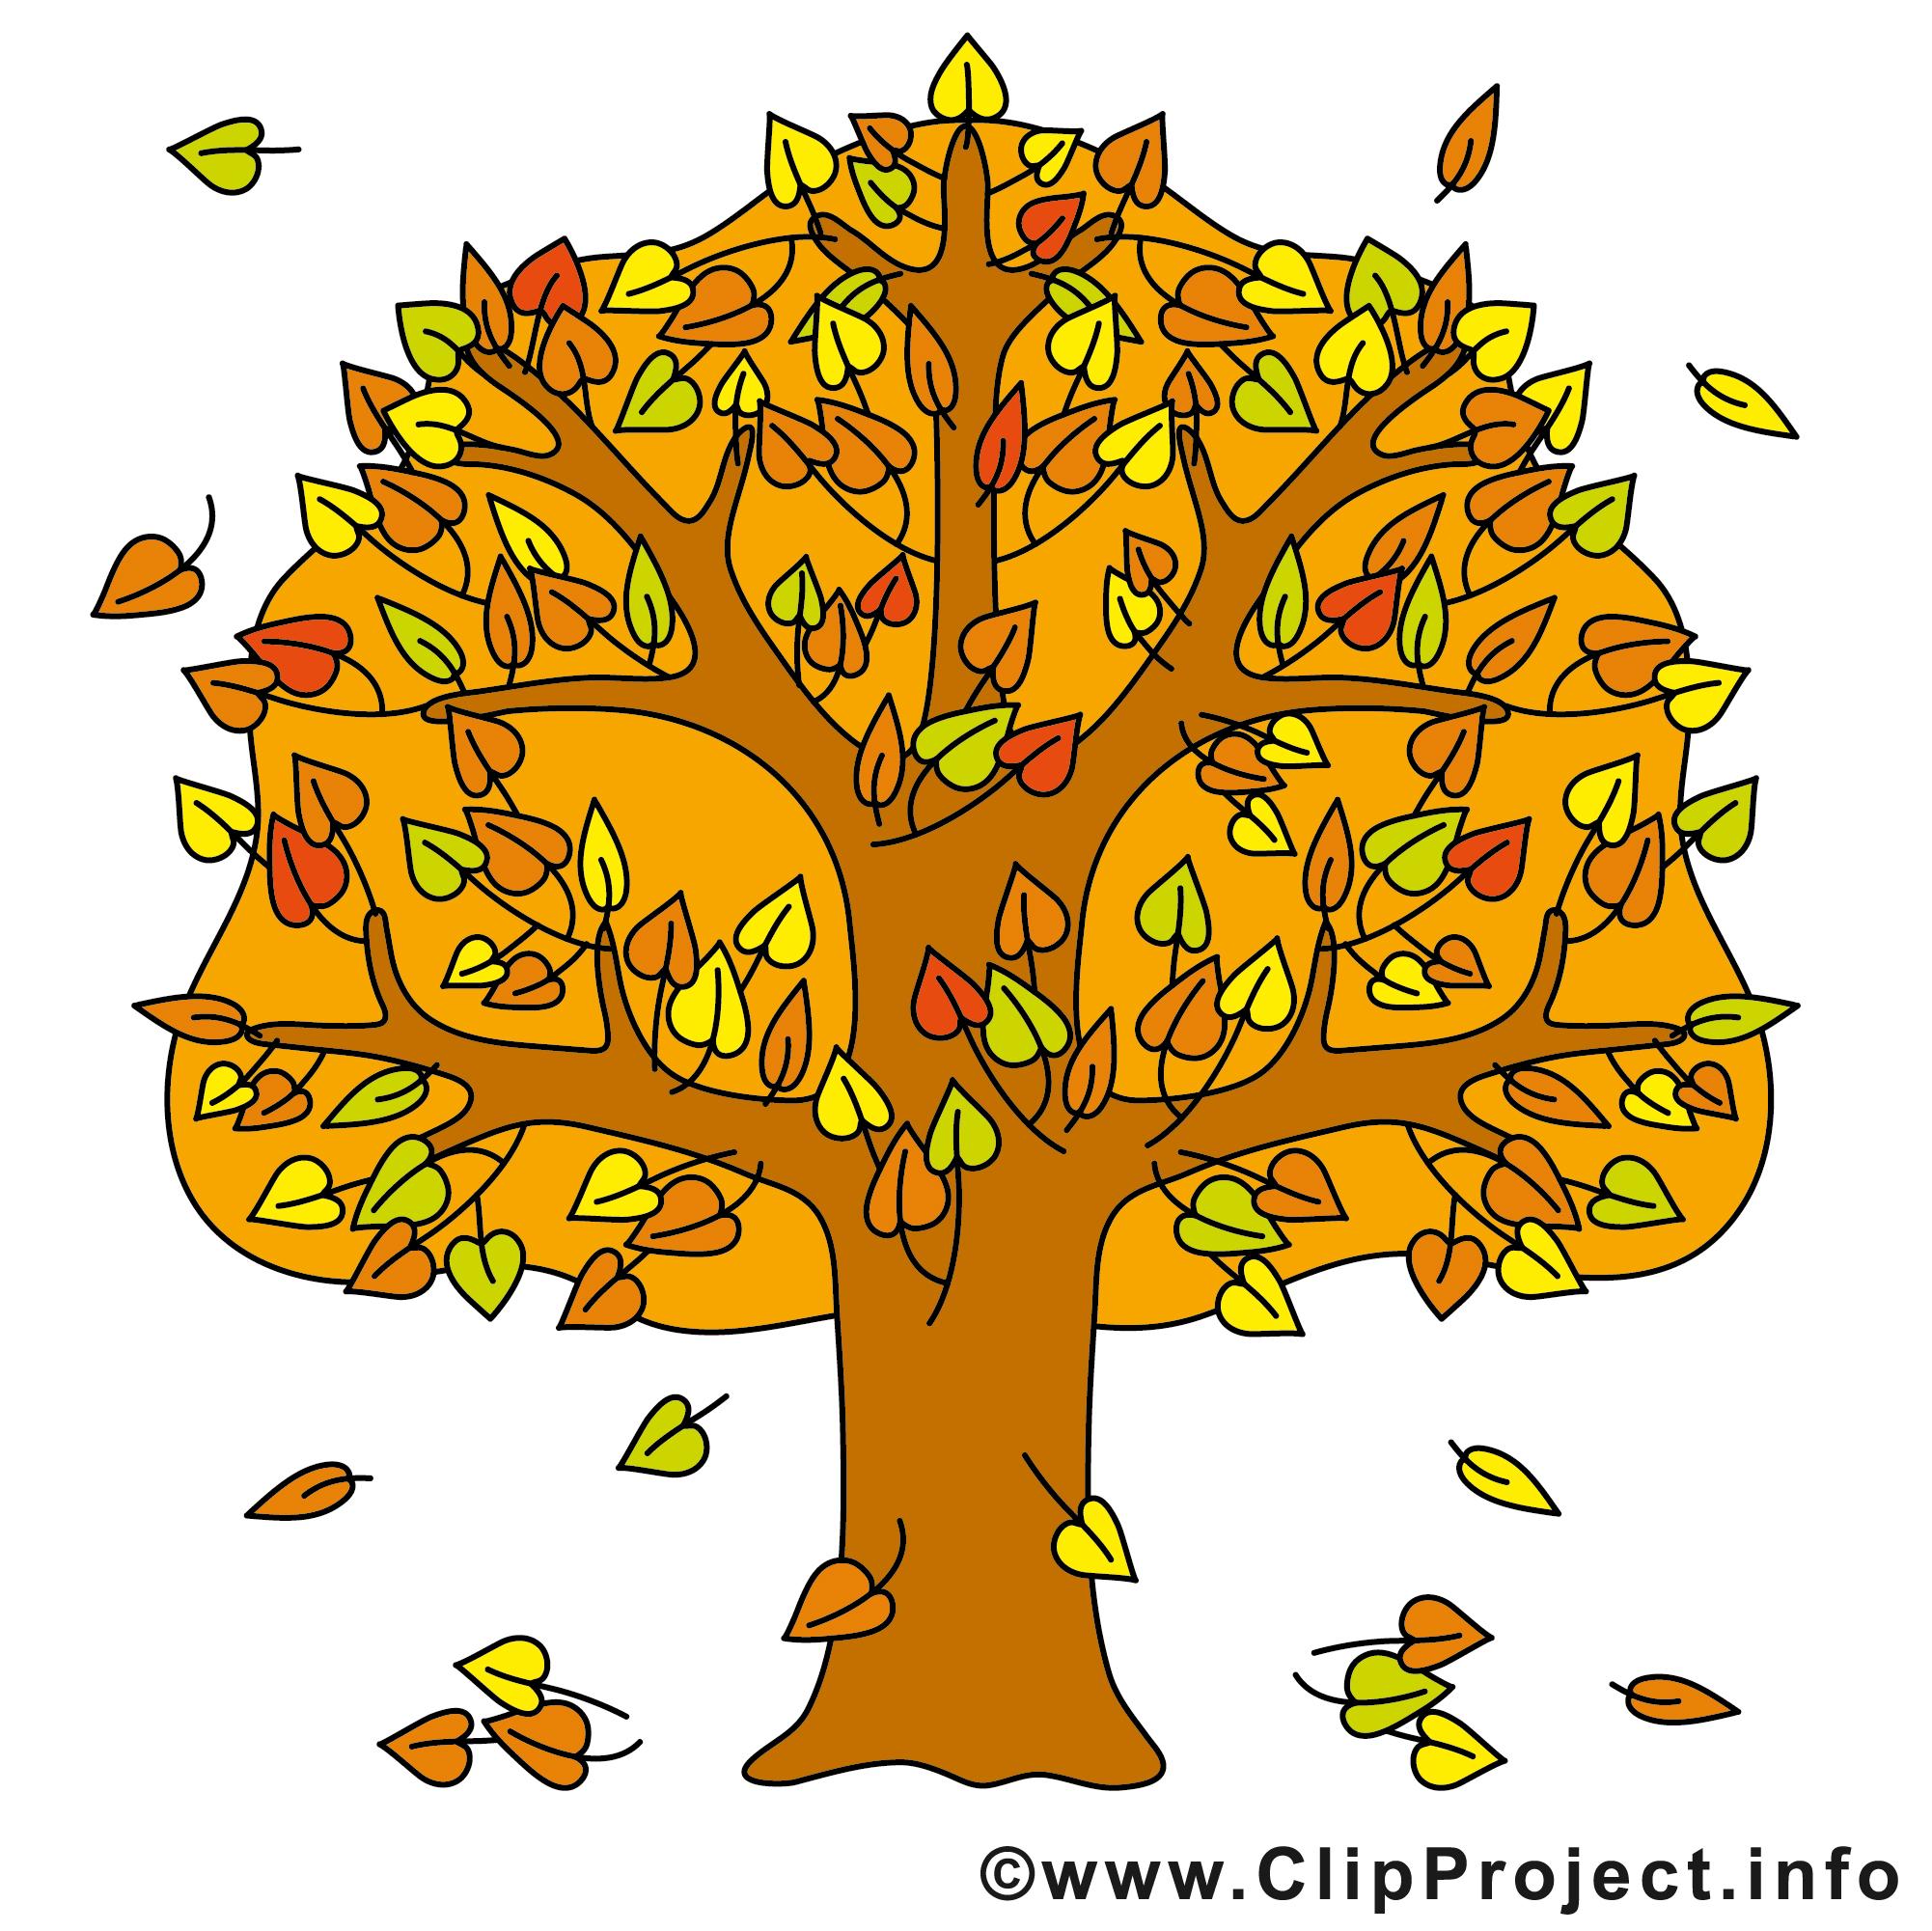 Gratis clipart bilder jpg library download Gratis clipart bilder - ClipartFest jpg library download